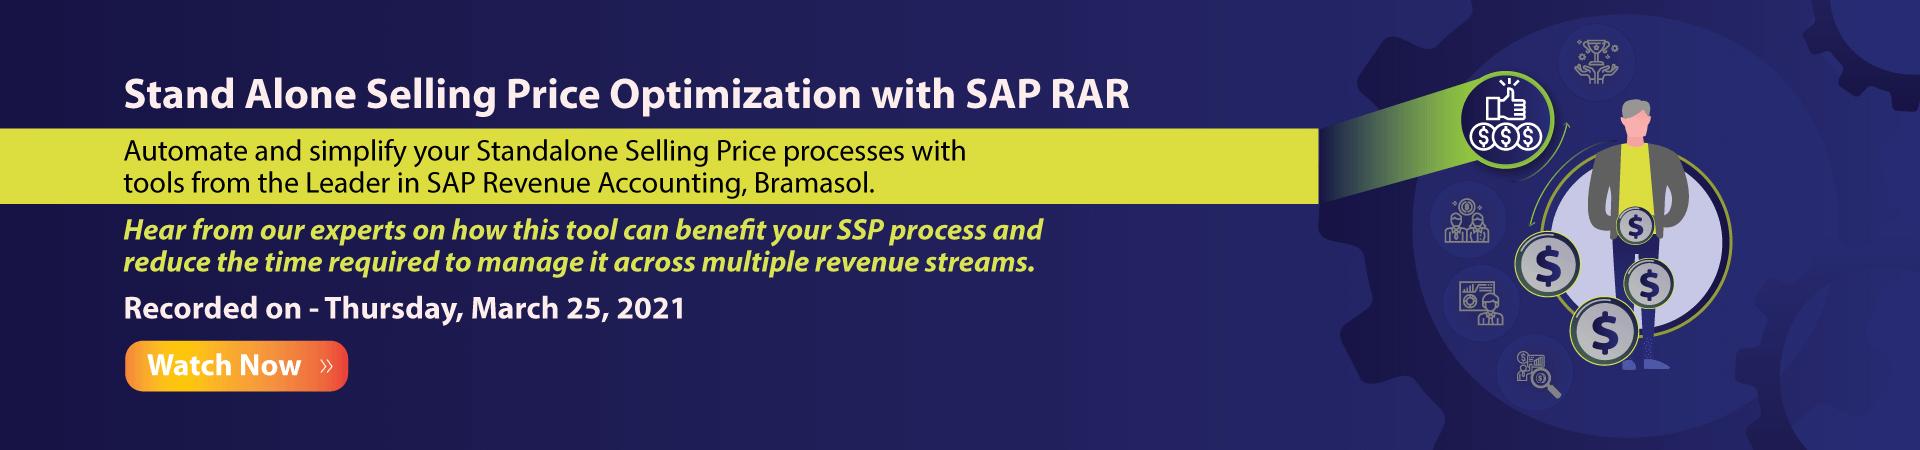 SAP Revenue Accounting Banner